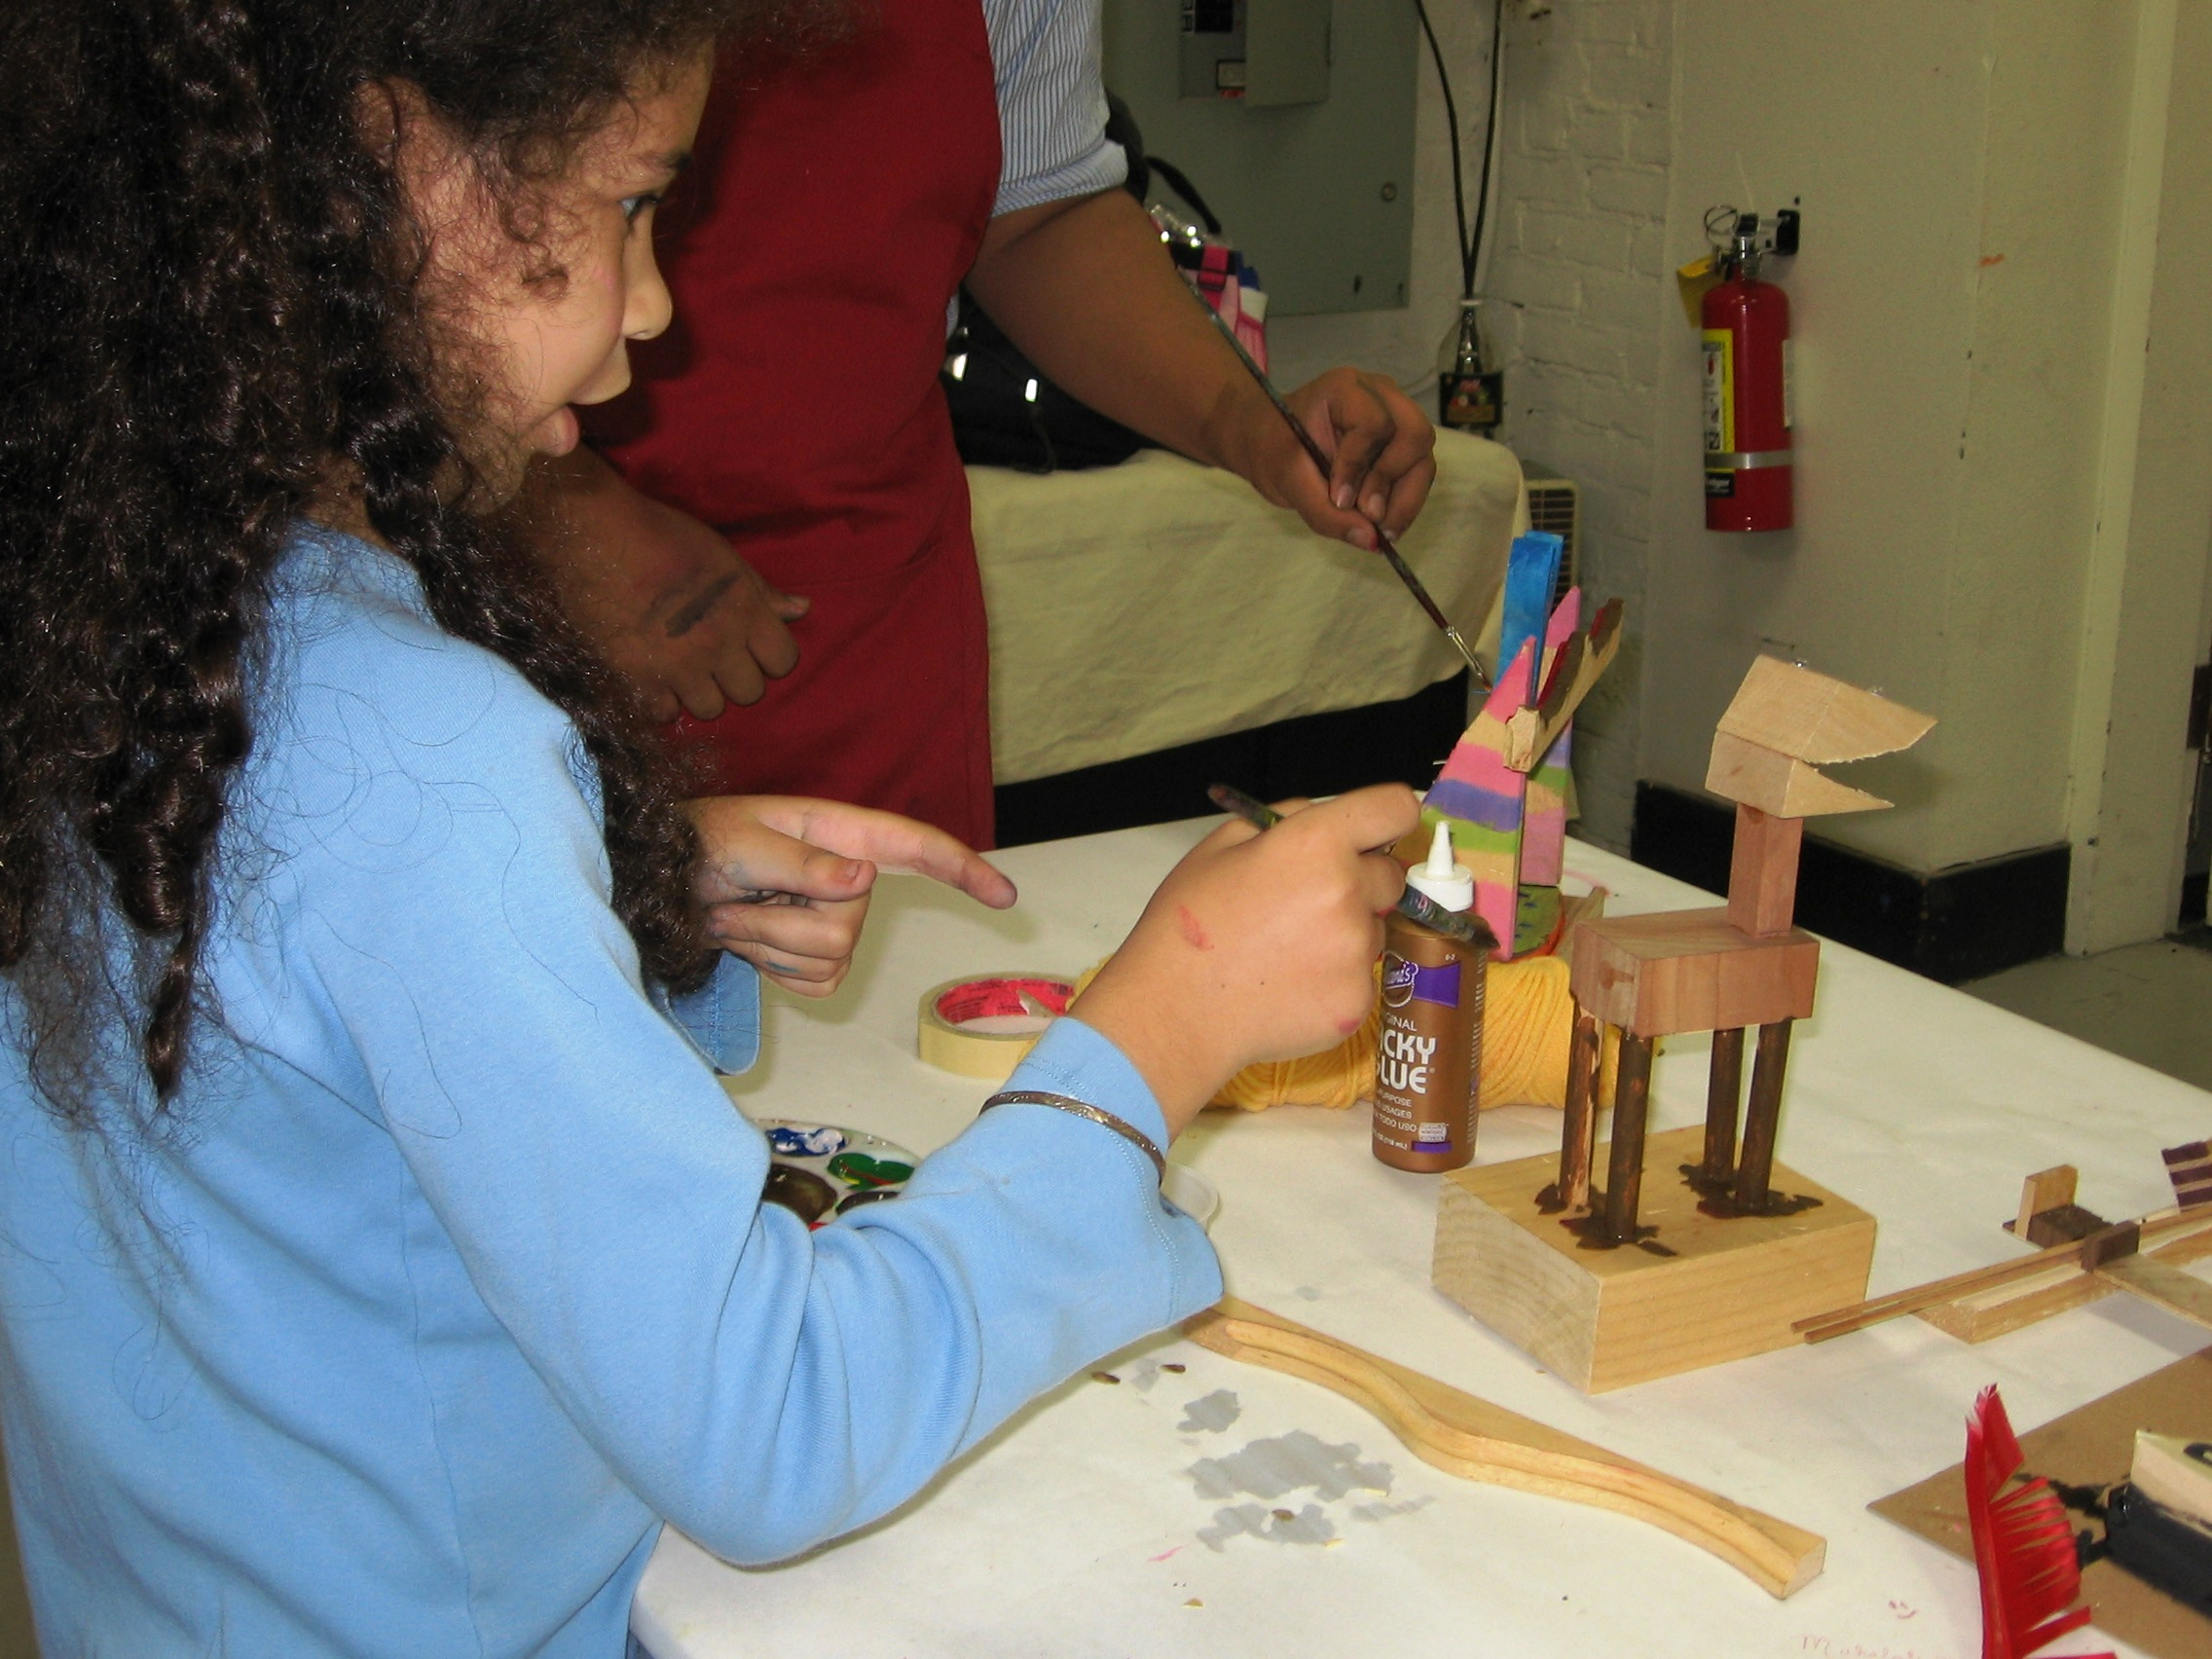 Home School Class: Let's Build